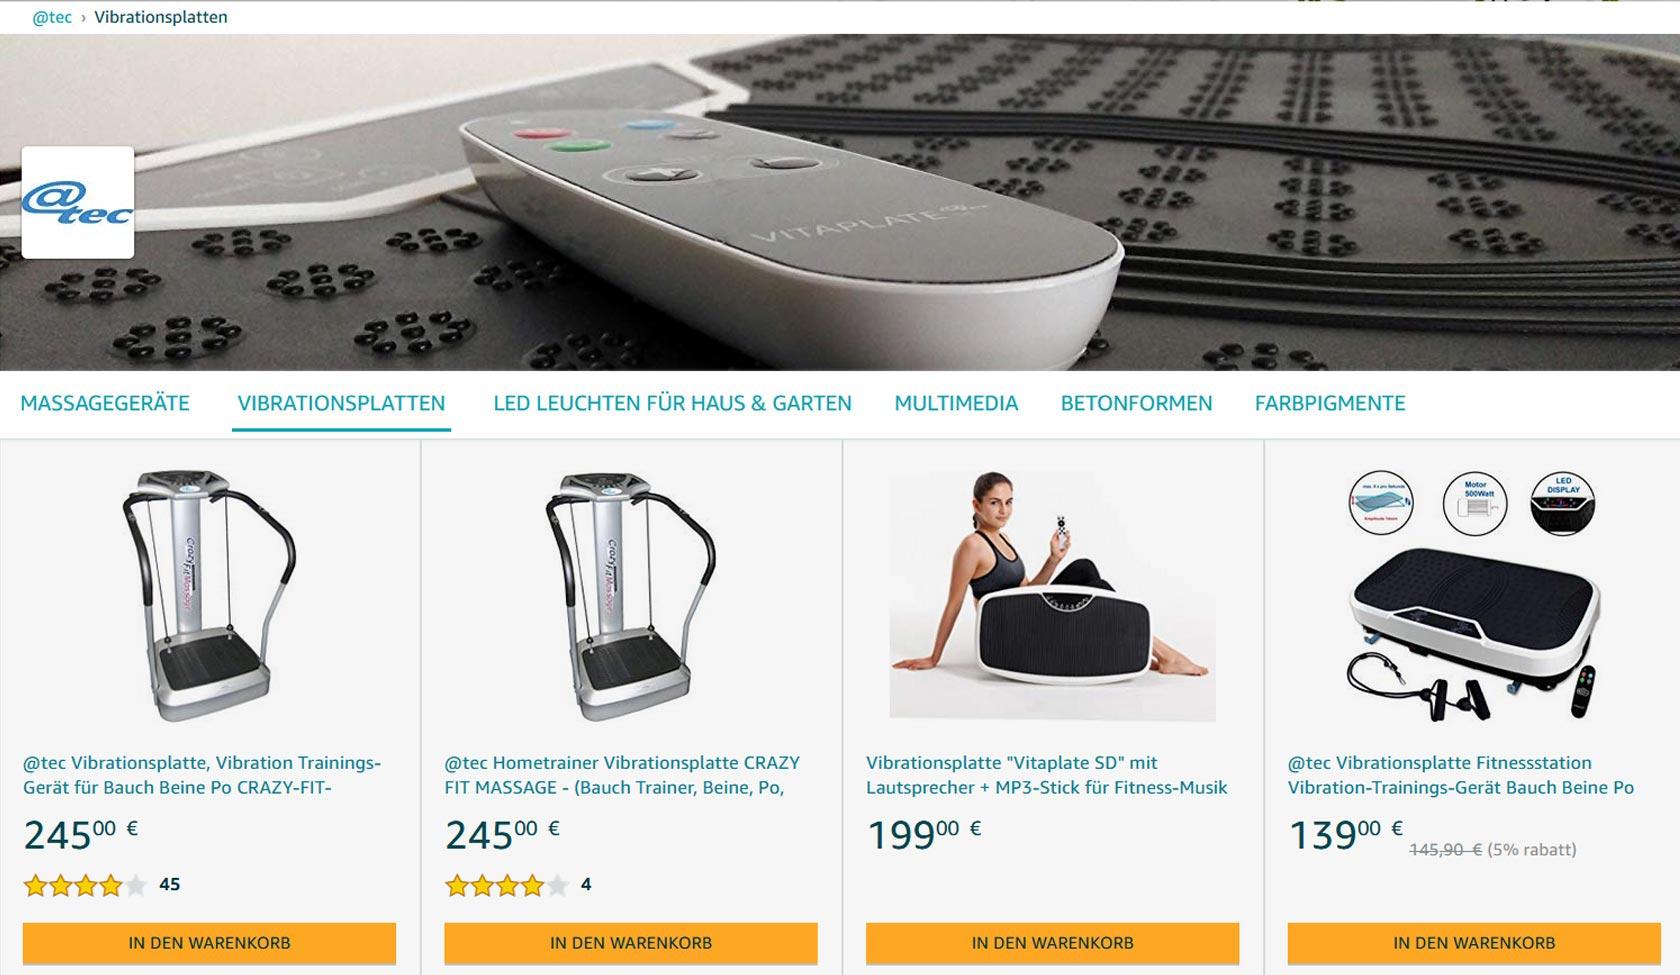 @tec Markenwelt auf Amazon, Vibrationsplatten